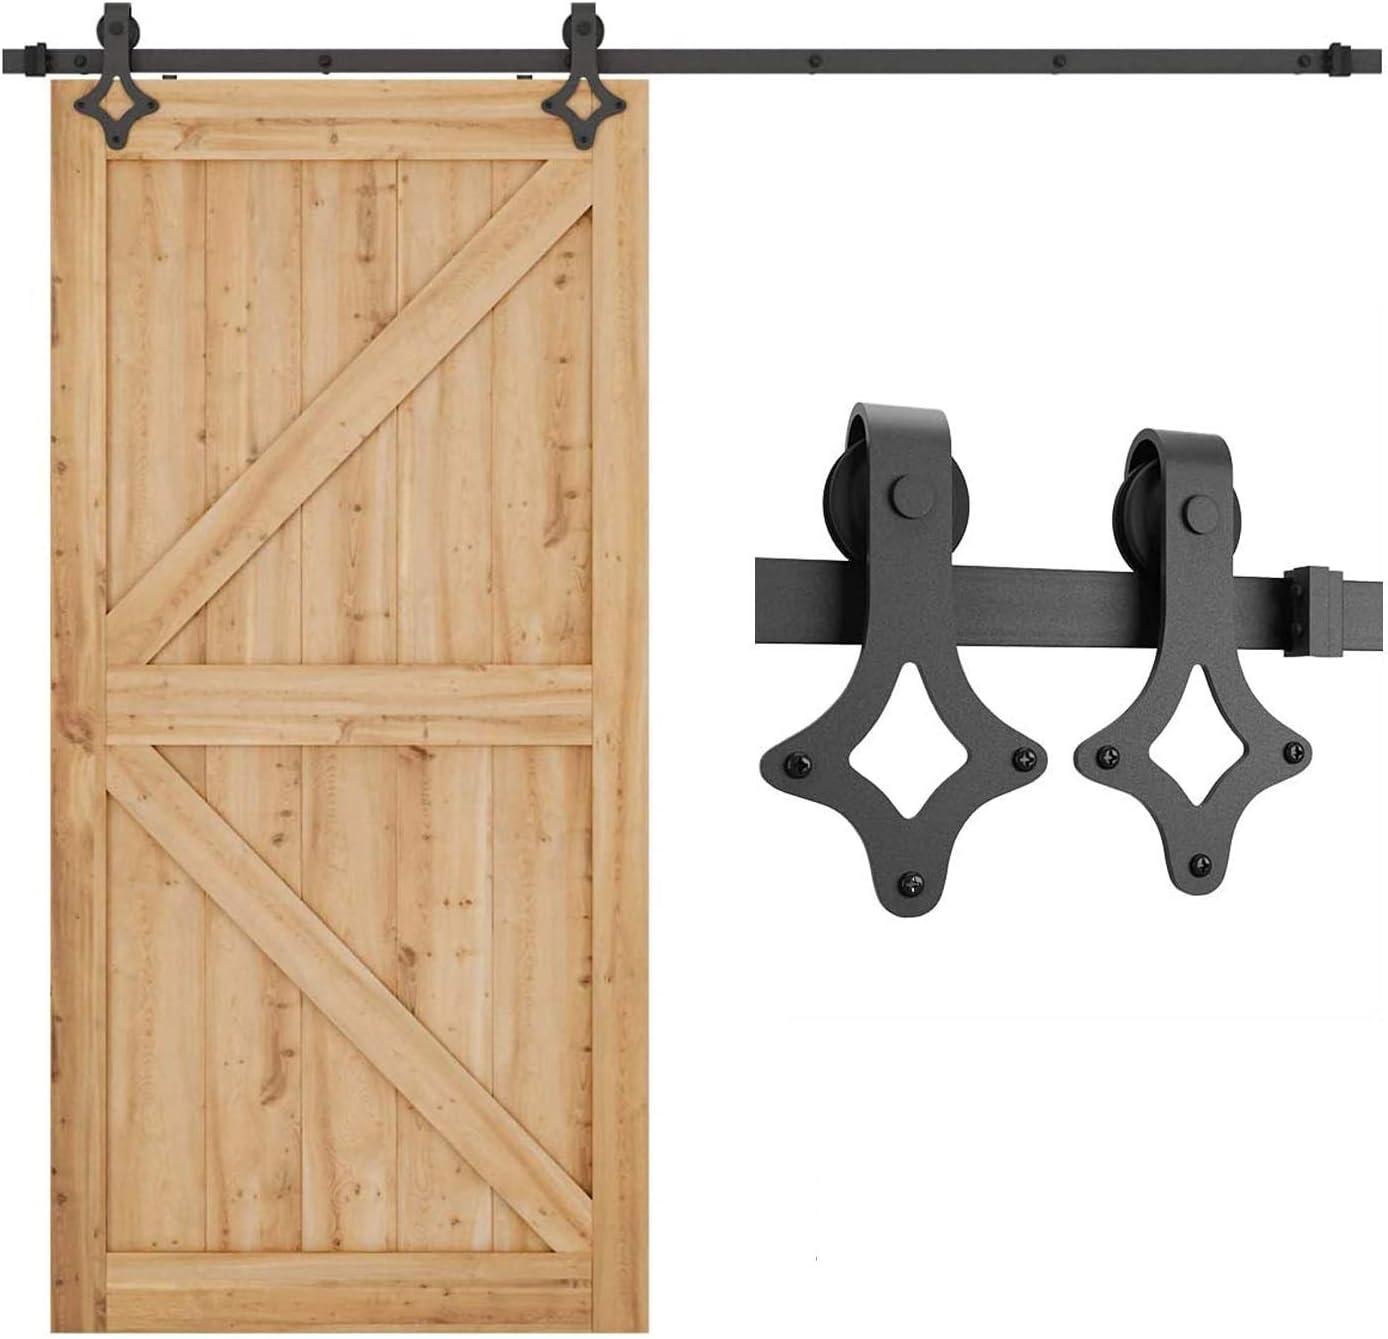 SMARTSTANDARD 8FT Heavy Duty Sliding New product! New type Door Barn Hardware Sin Kit Superlatite